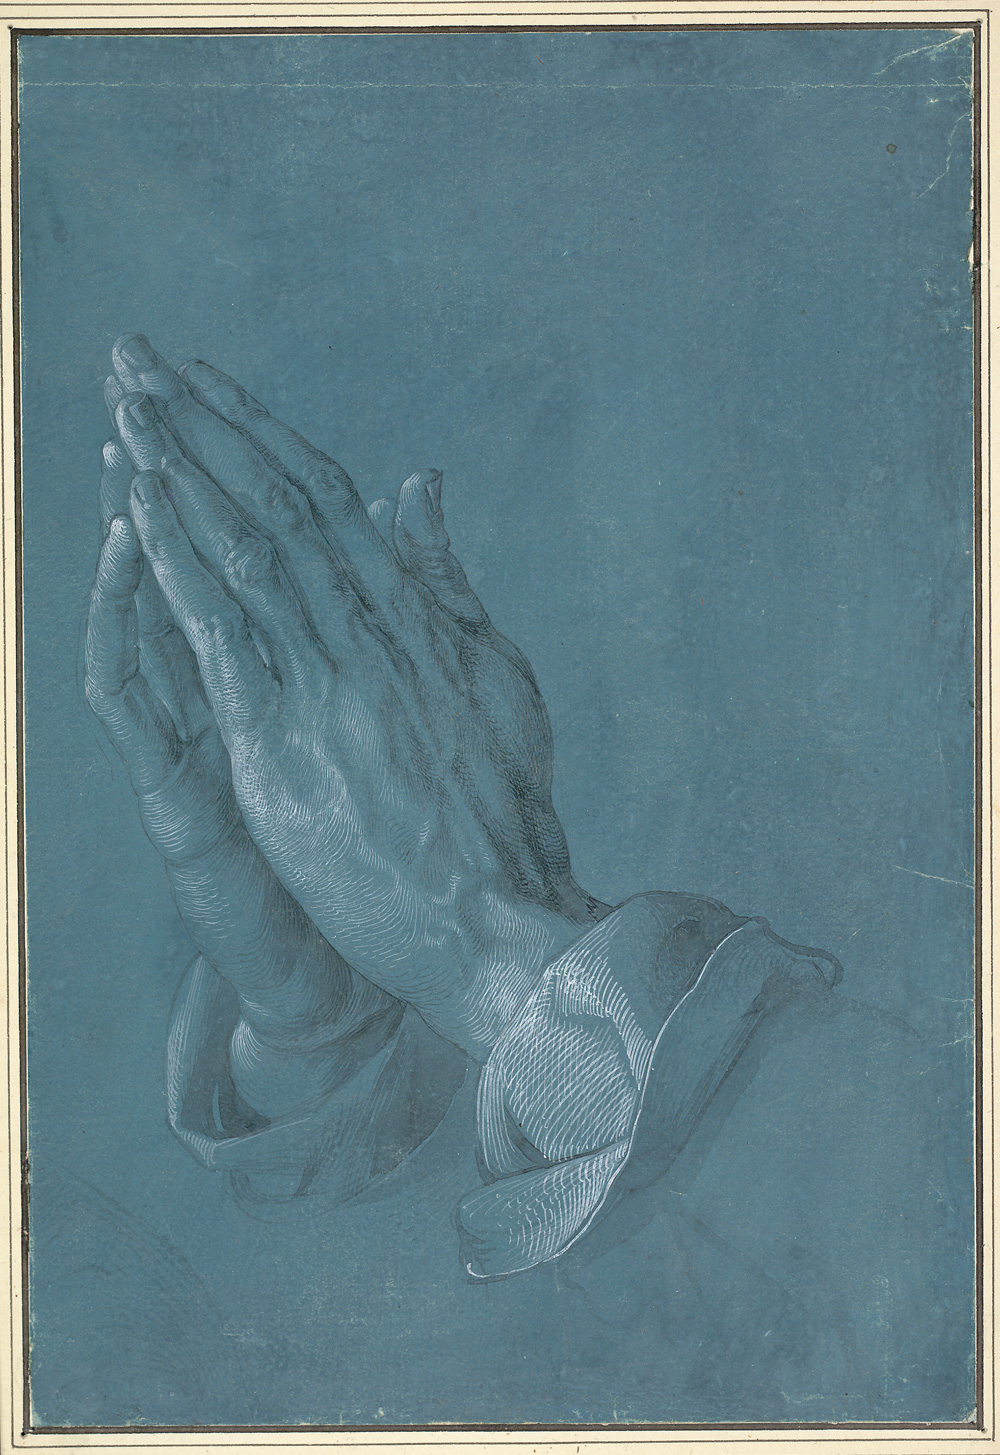 durer_praying-hands.jpg